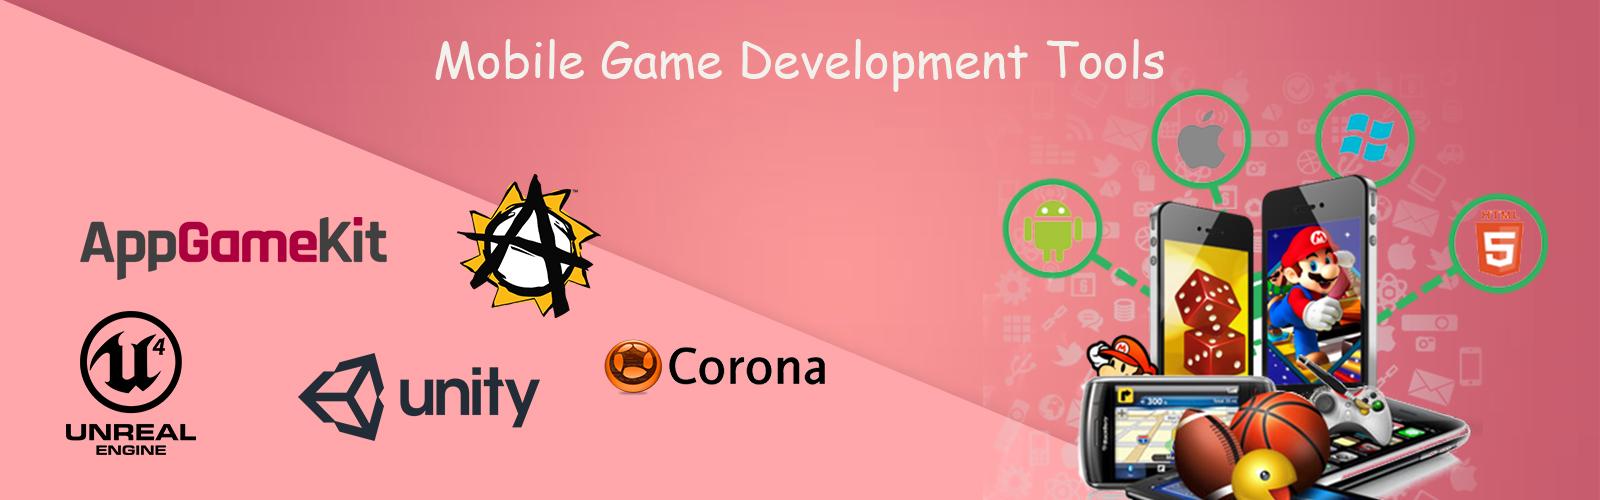 5 Best mobile game development tools - Maadi